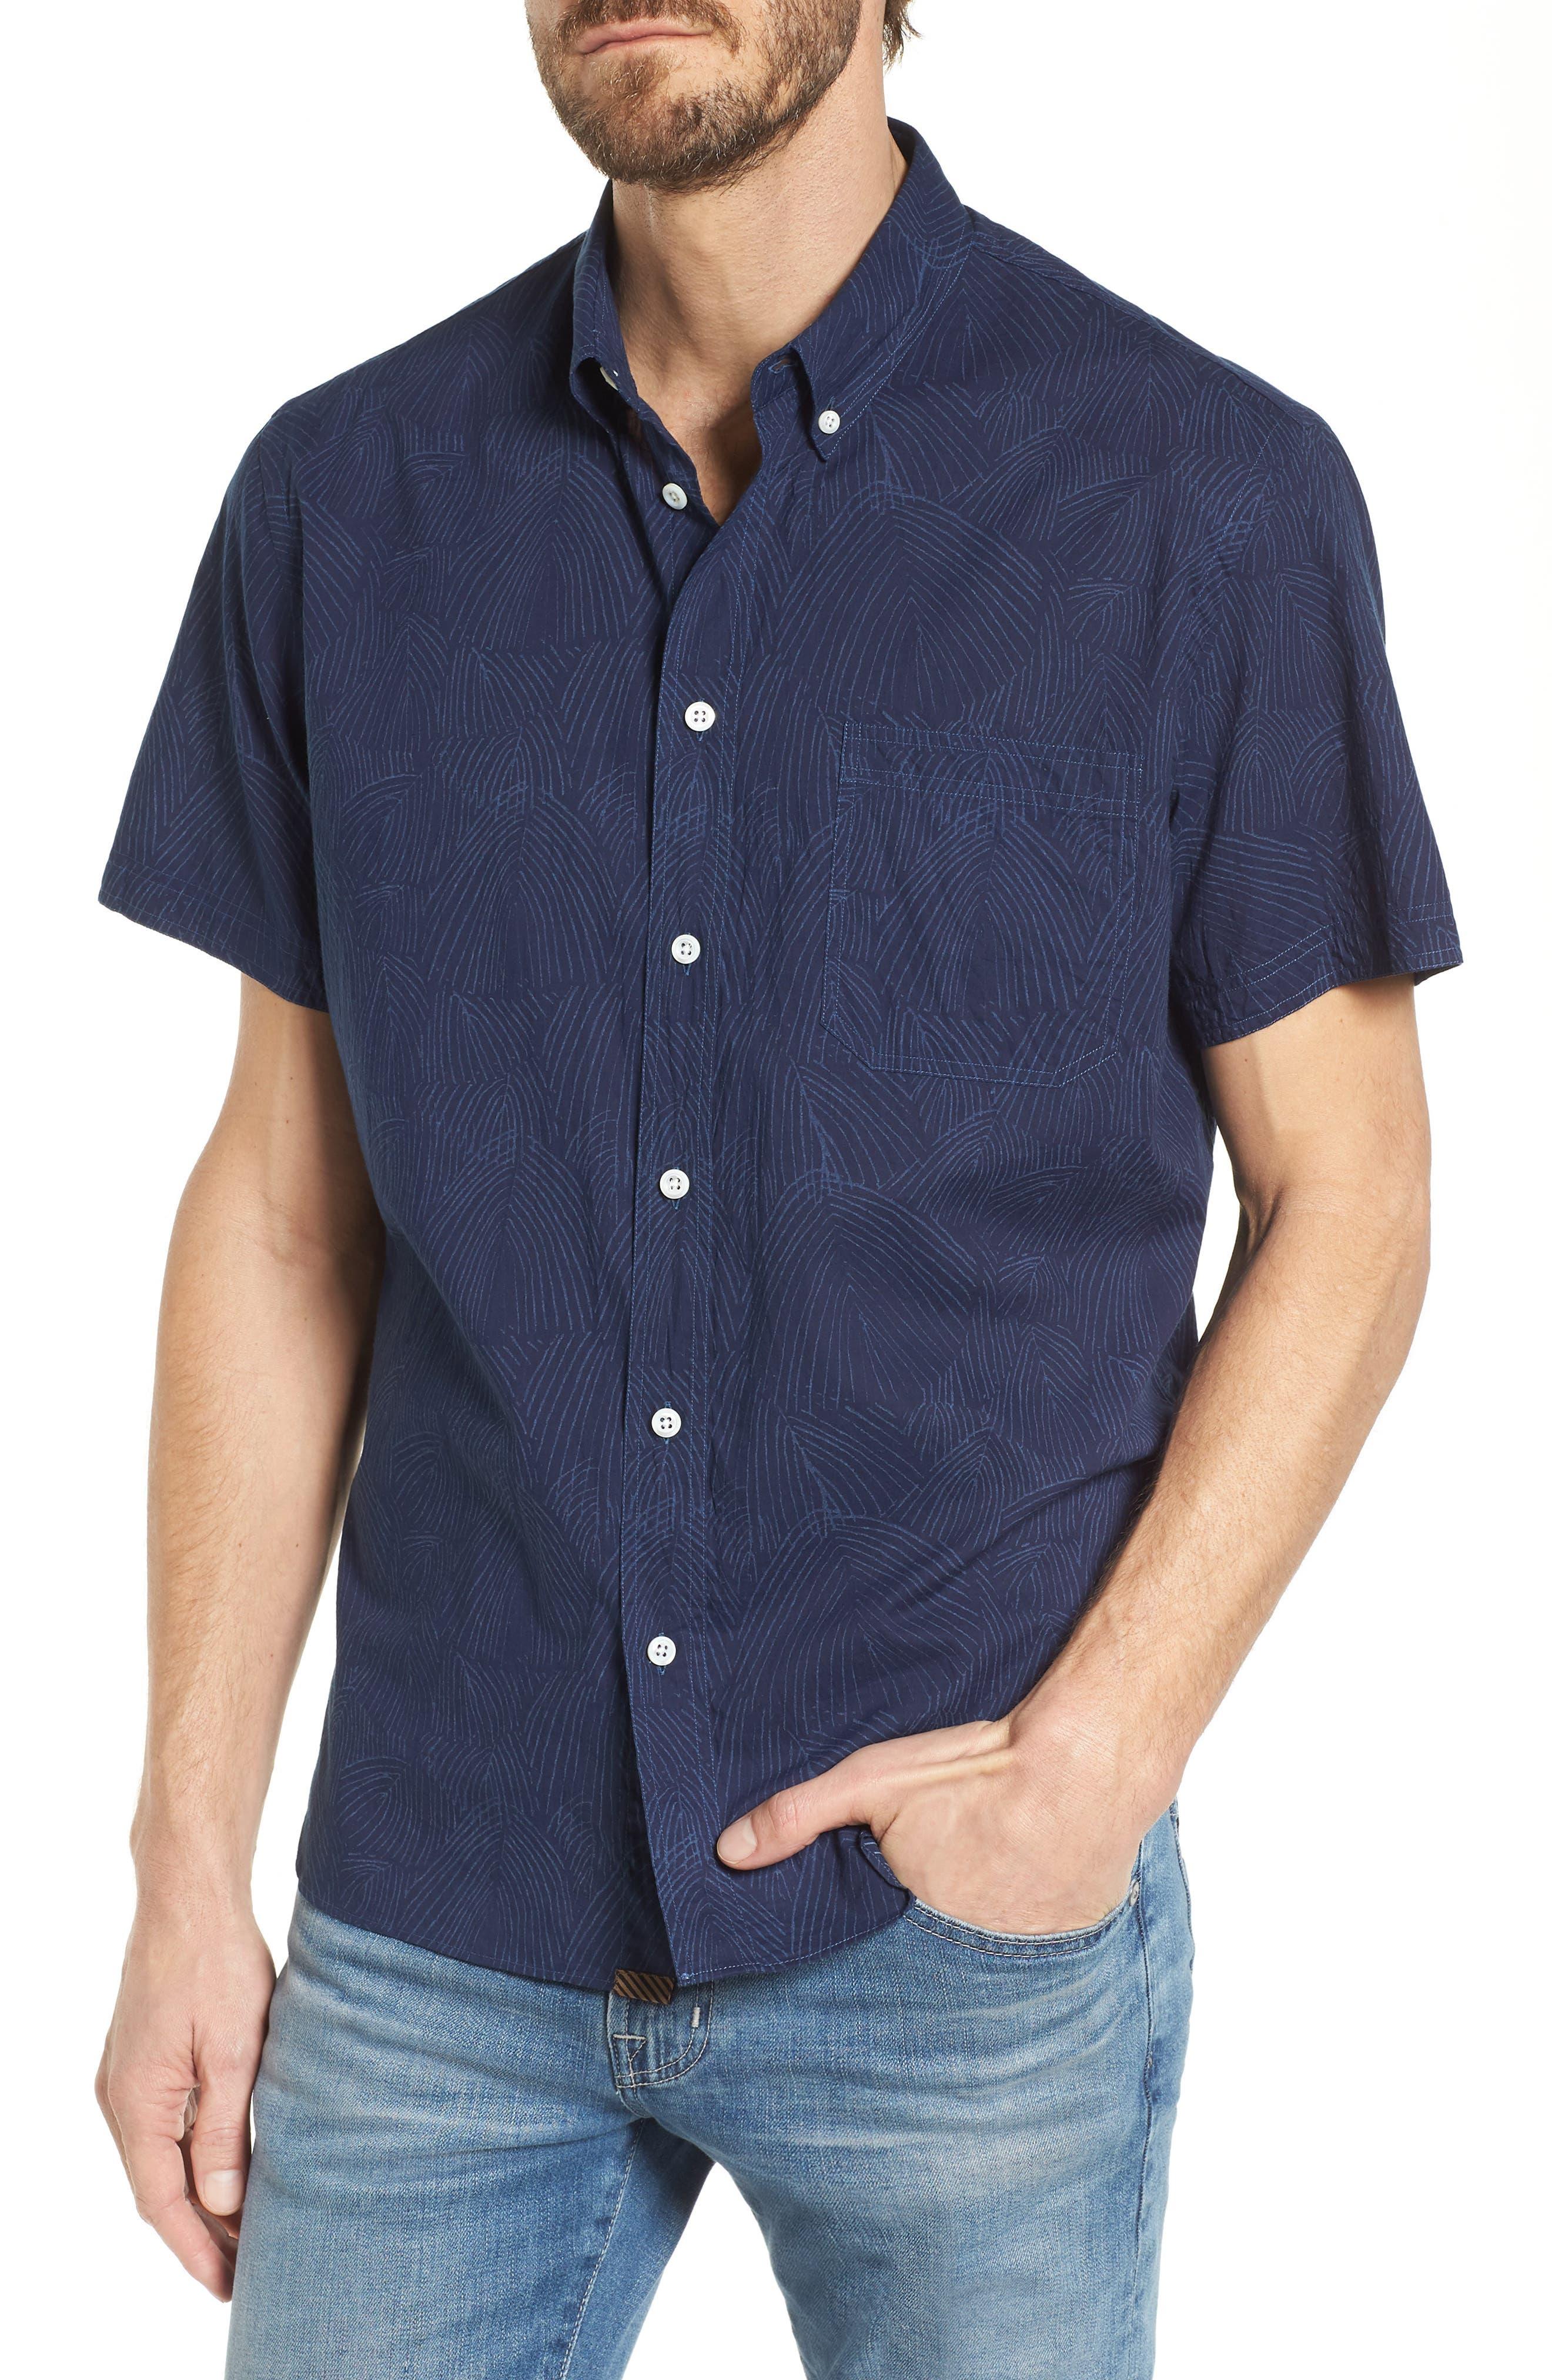 Tuscumbia Slim Fit Sport Shirt,                             Main thumbnail 1, color,                             407